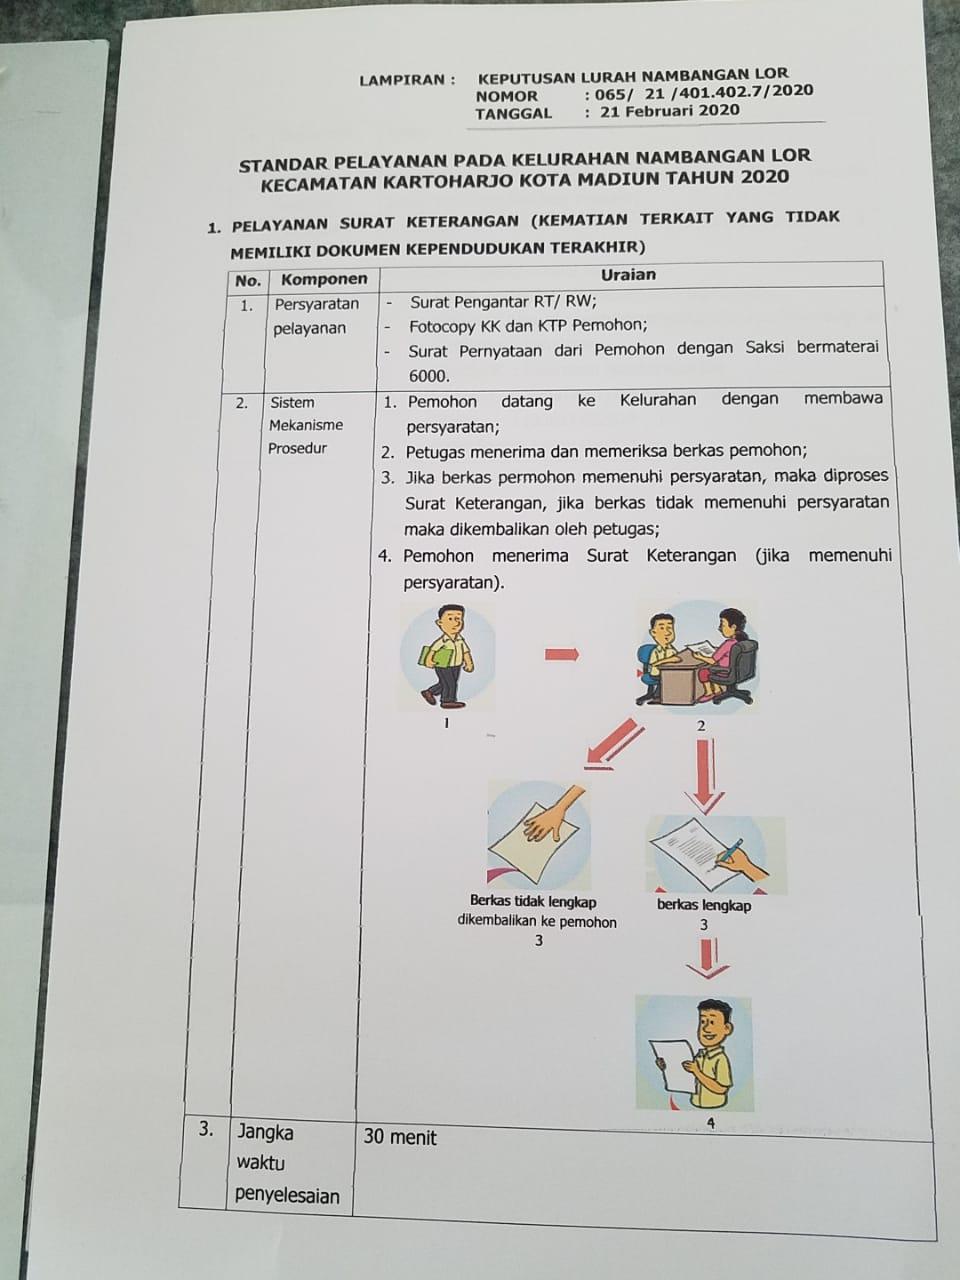 Lampiran Keputusan Lurah Nambangan Lor Tentang Standar Pelayanan pada Kelurahan Nambangan Lor Kec Manguharjo Kota Madiun